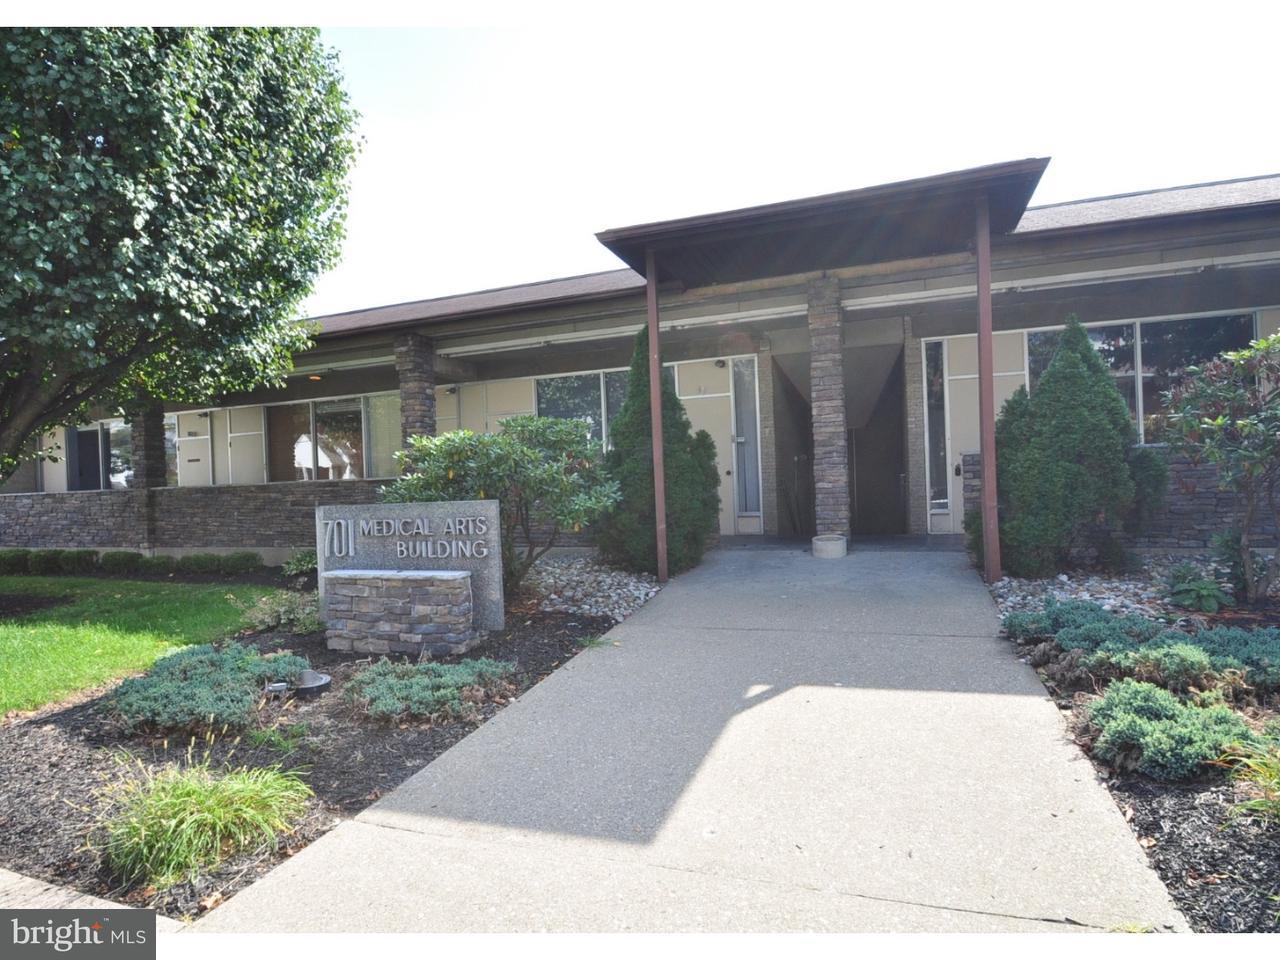 Single Family Home for Rent at 701 W UNION BLVD #8C Bethlehem, Pennsylvania 18018 United States